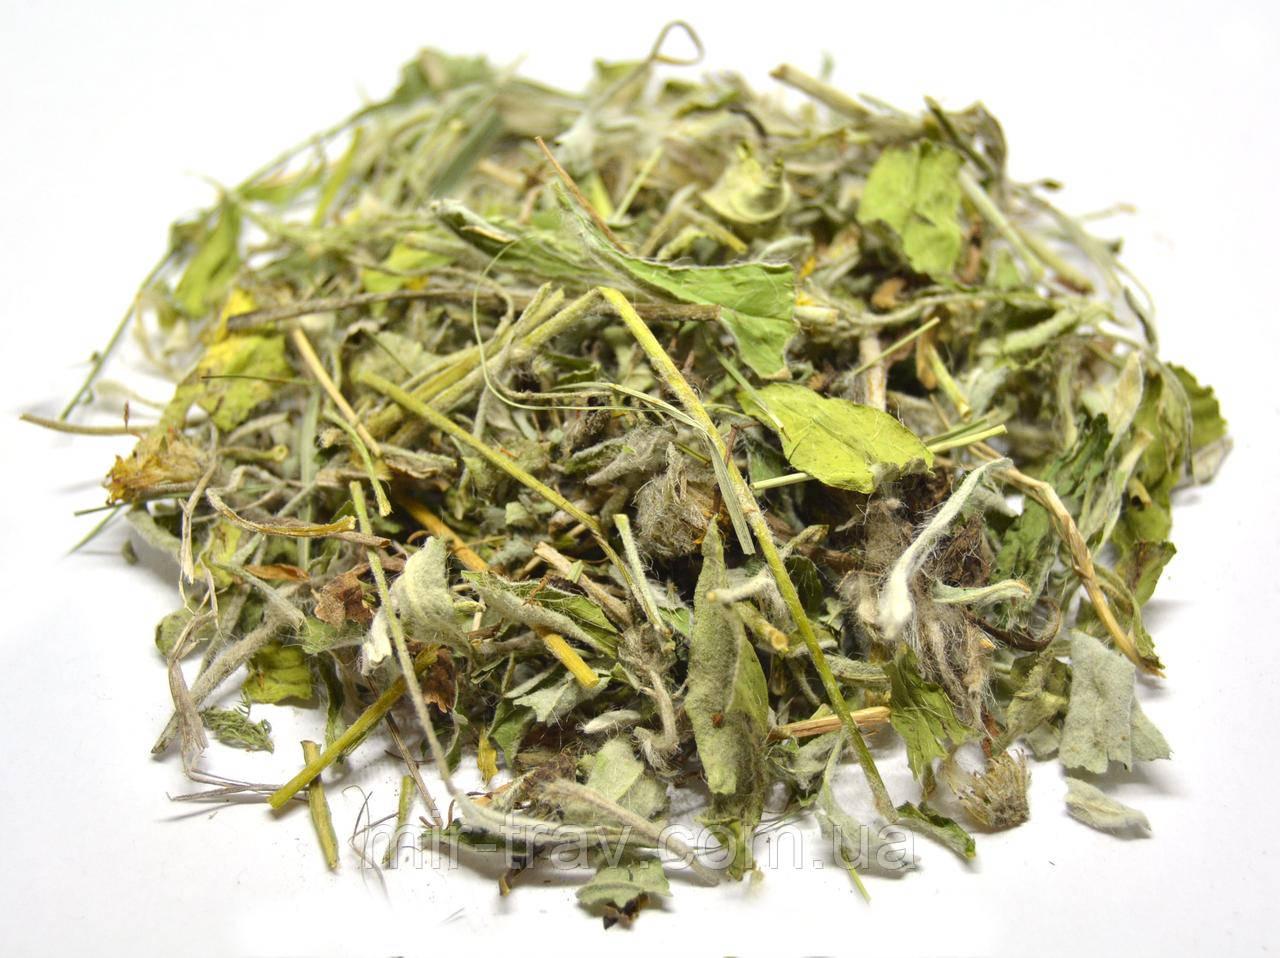 Ястребинка волосистая трава